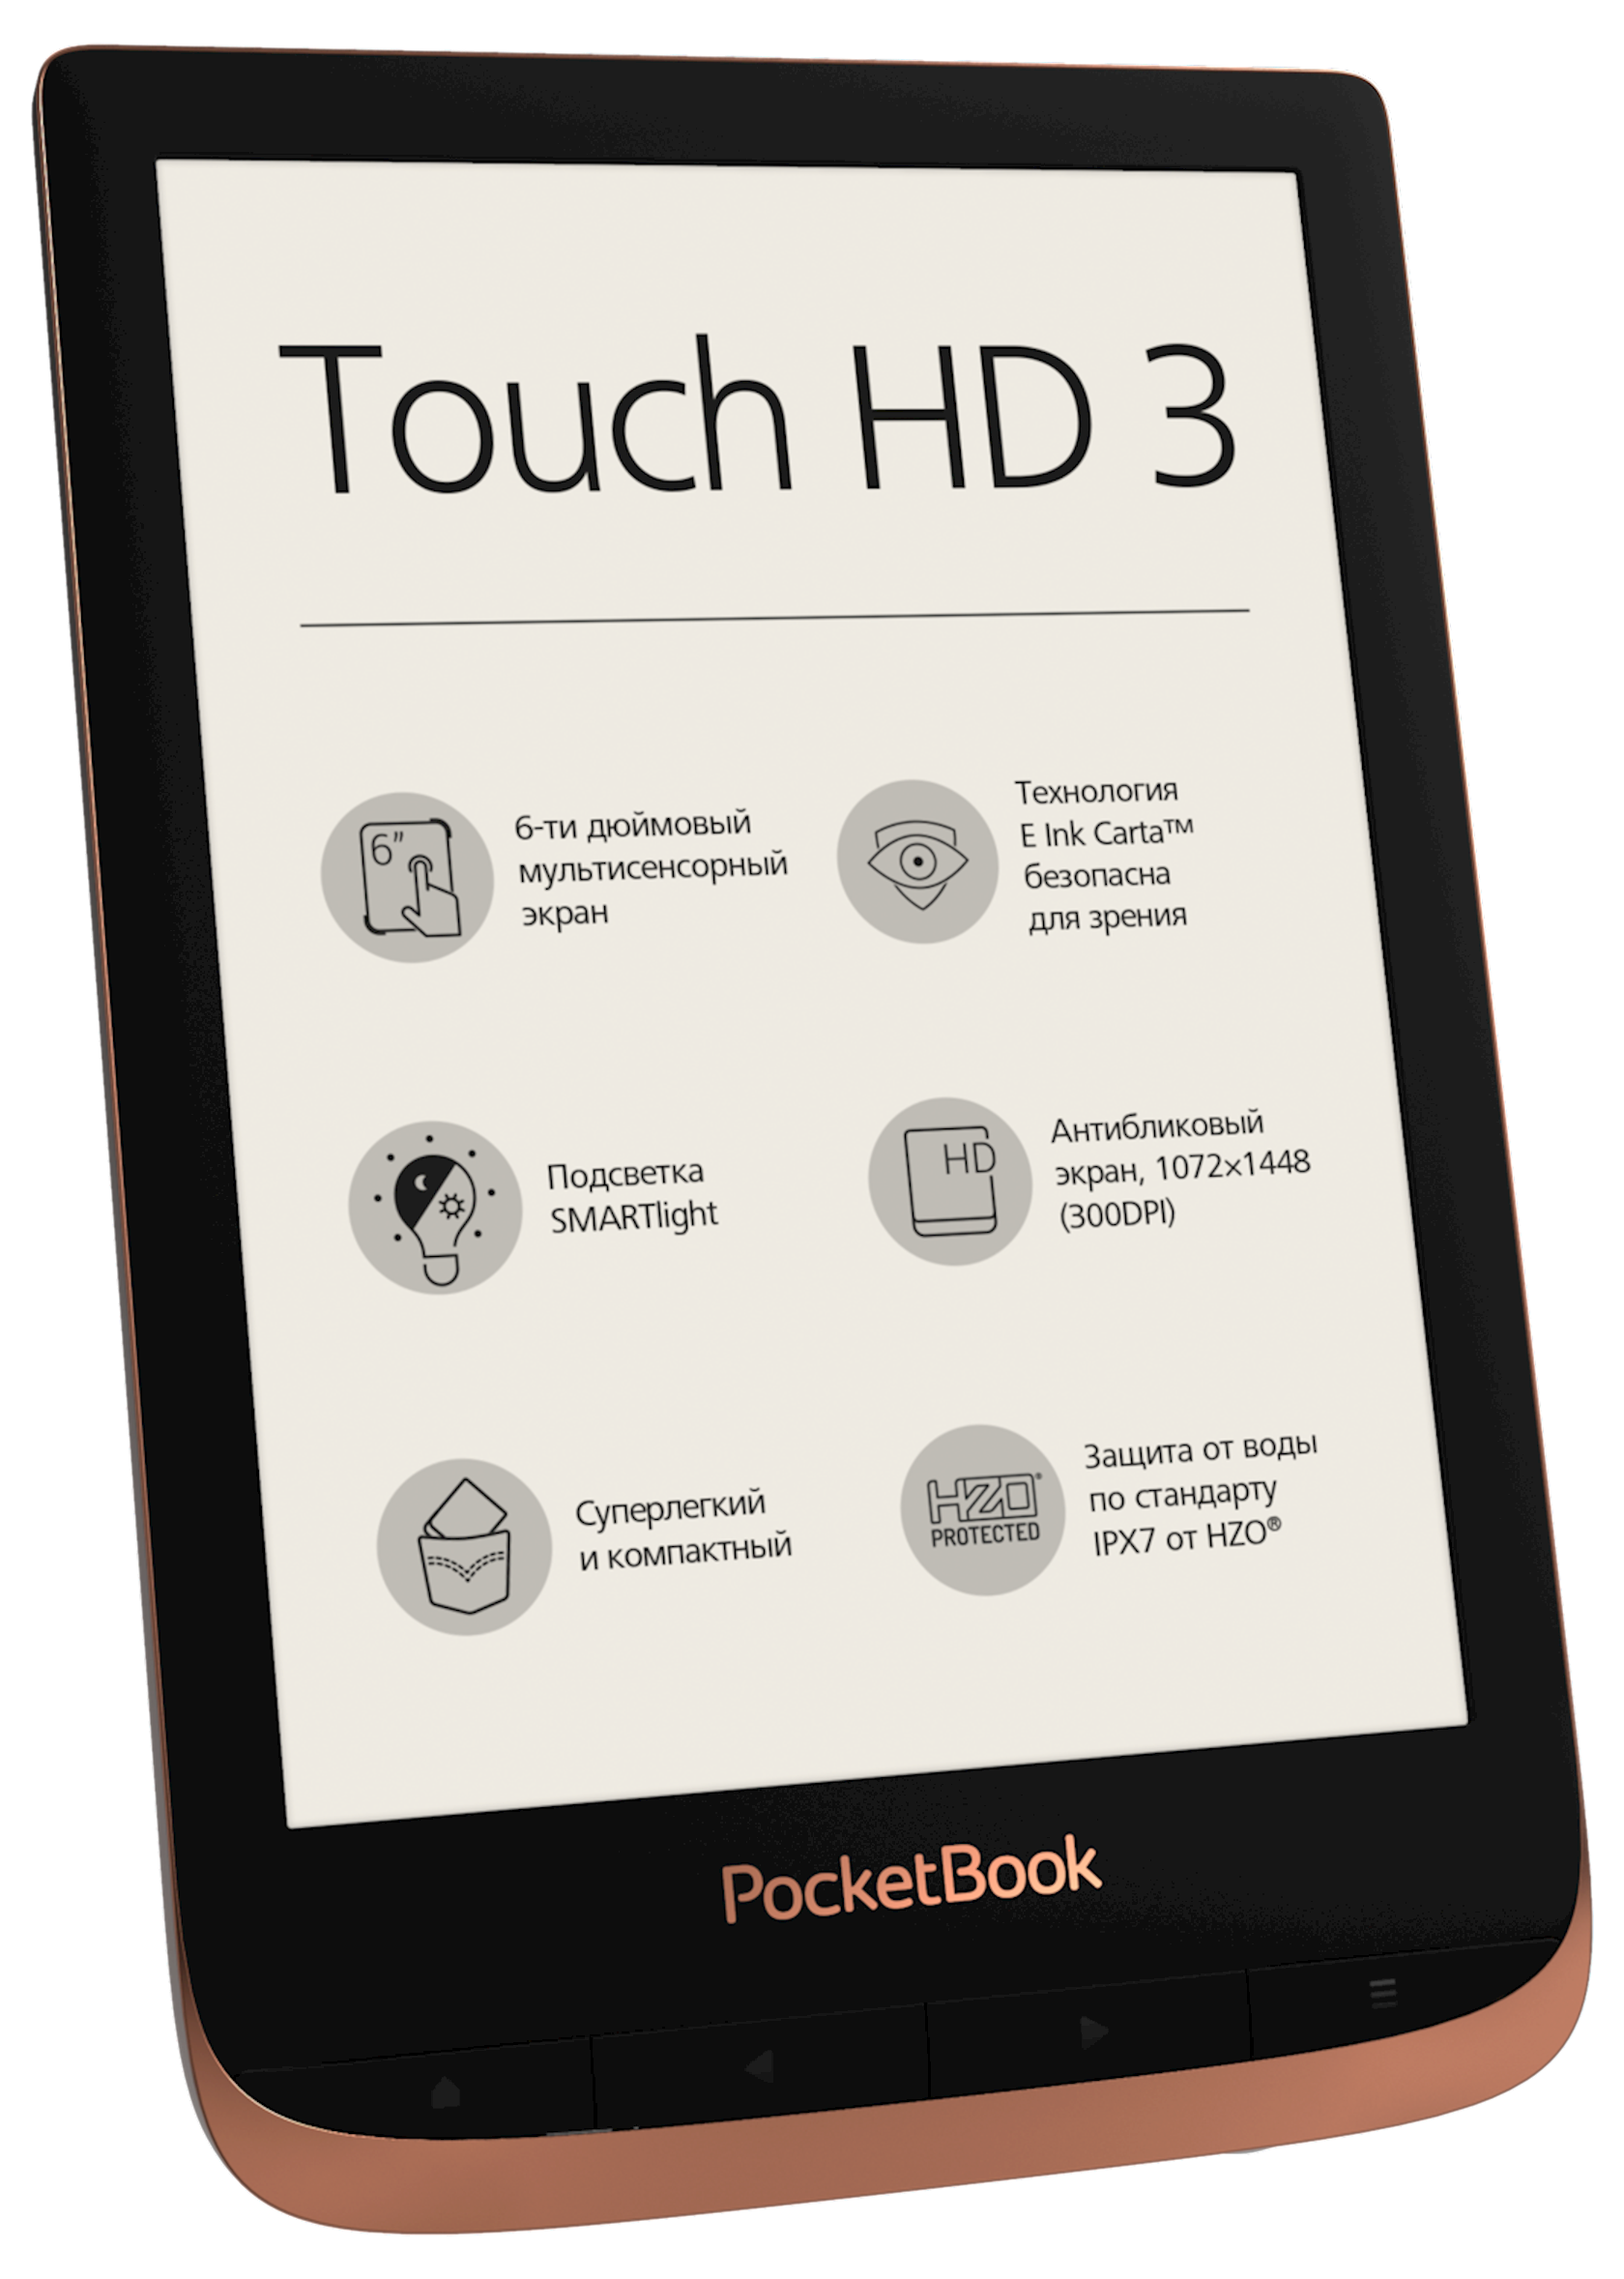 Elektron kitab PocketBook 632 Touch HD 3 Copper